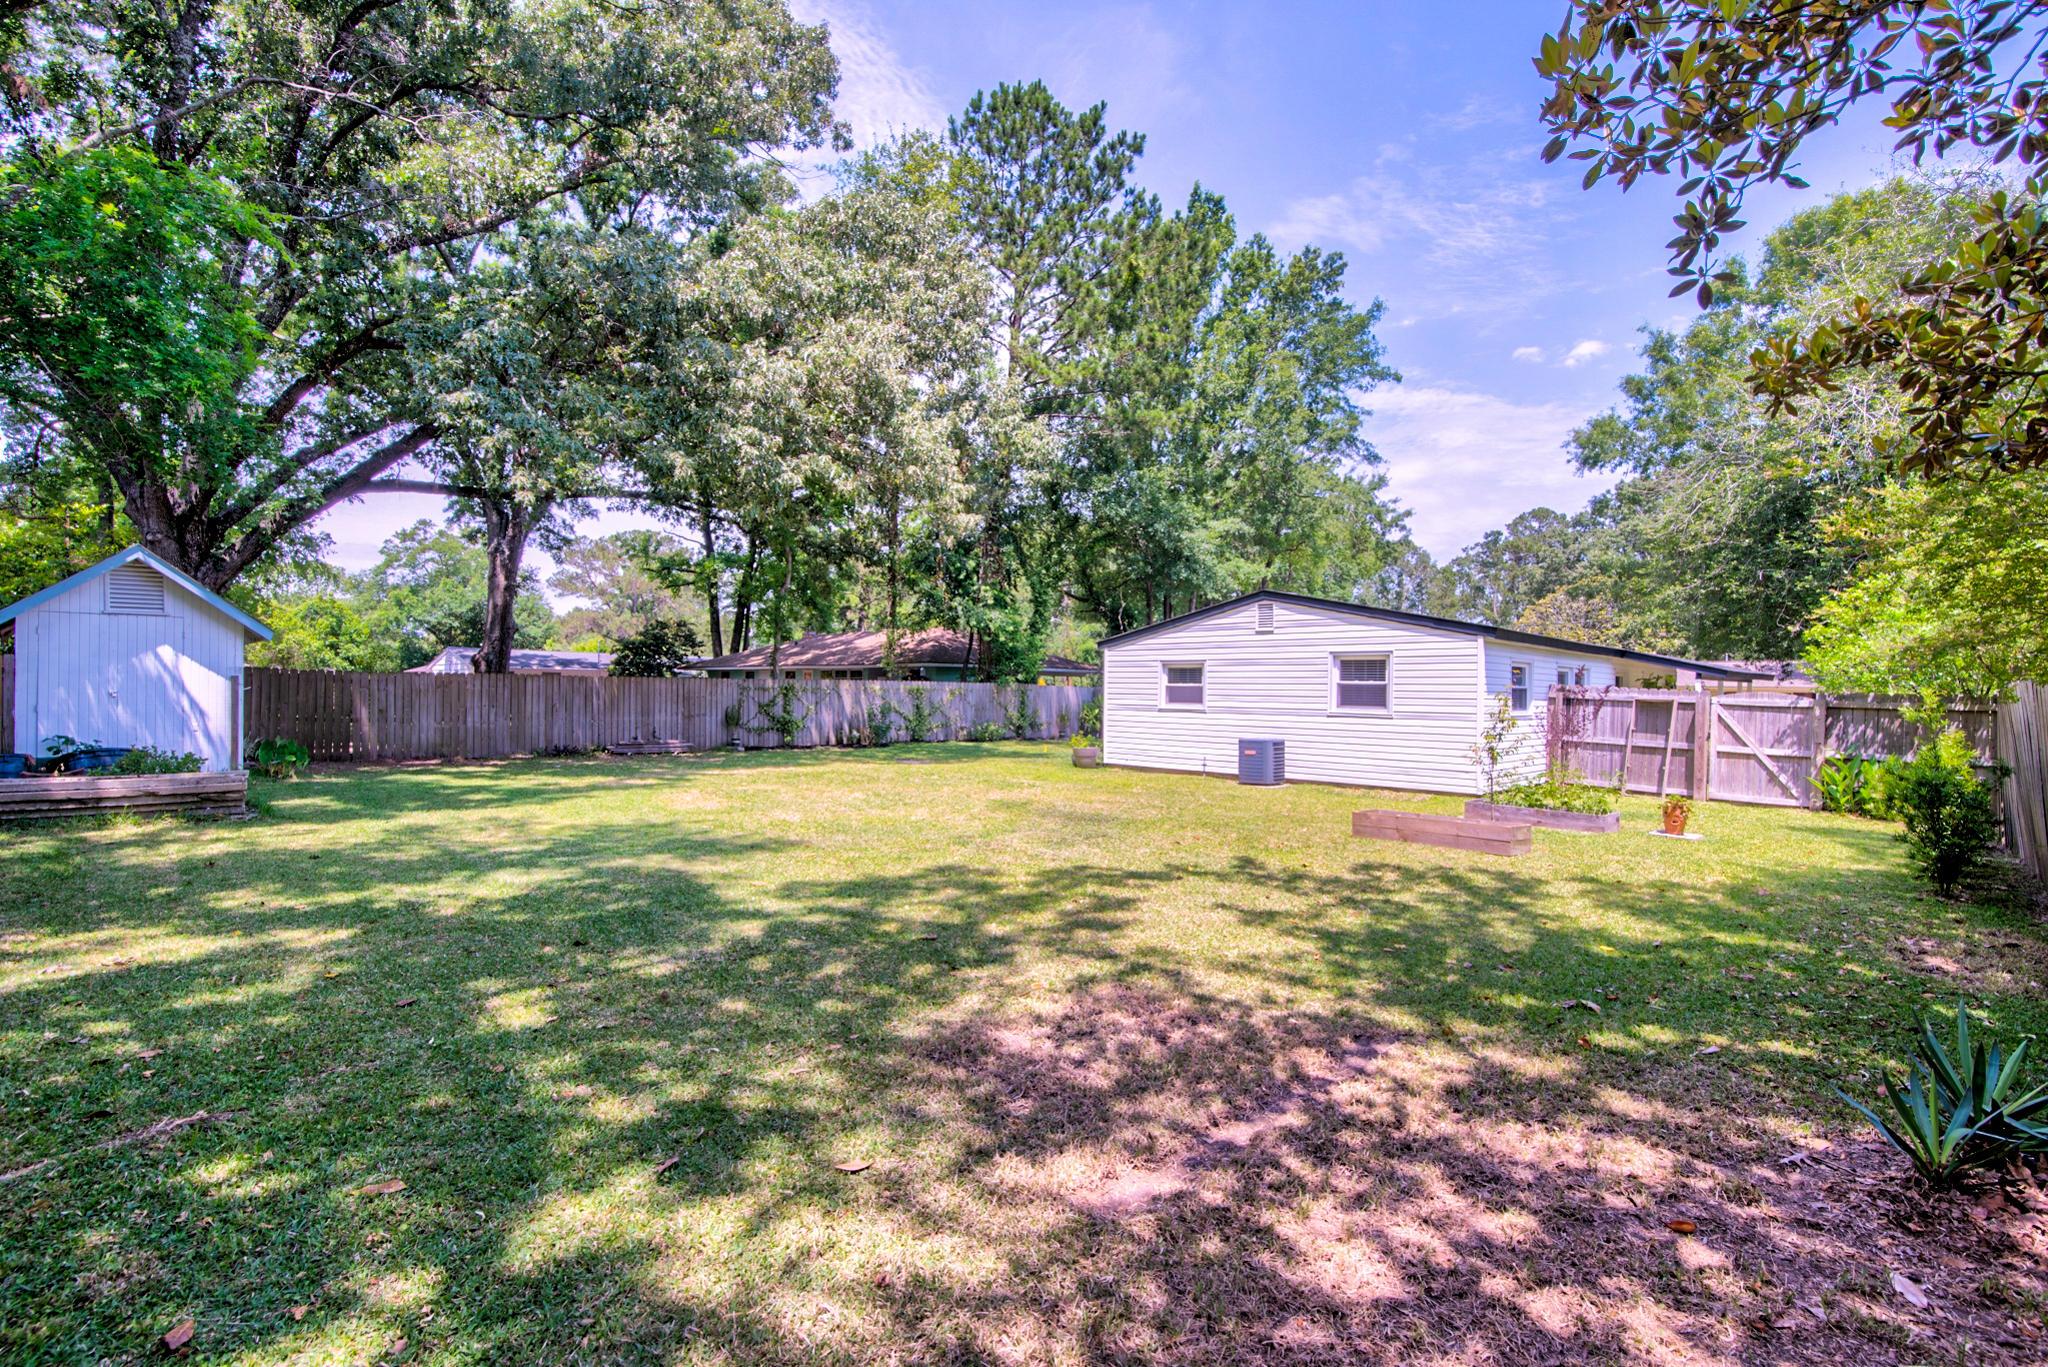 Oakland Homes For Sale - 2131 Clayton, Charleston, SC - 13